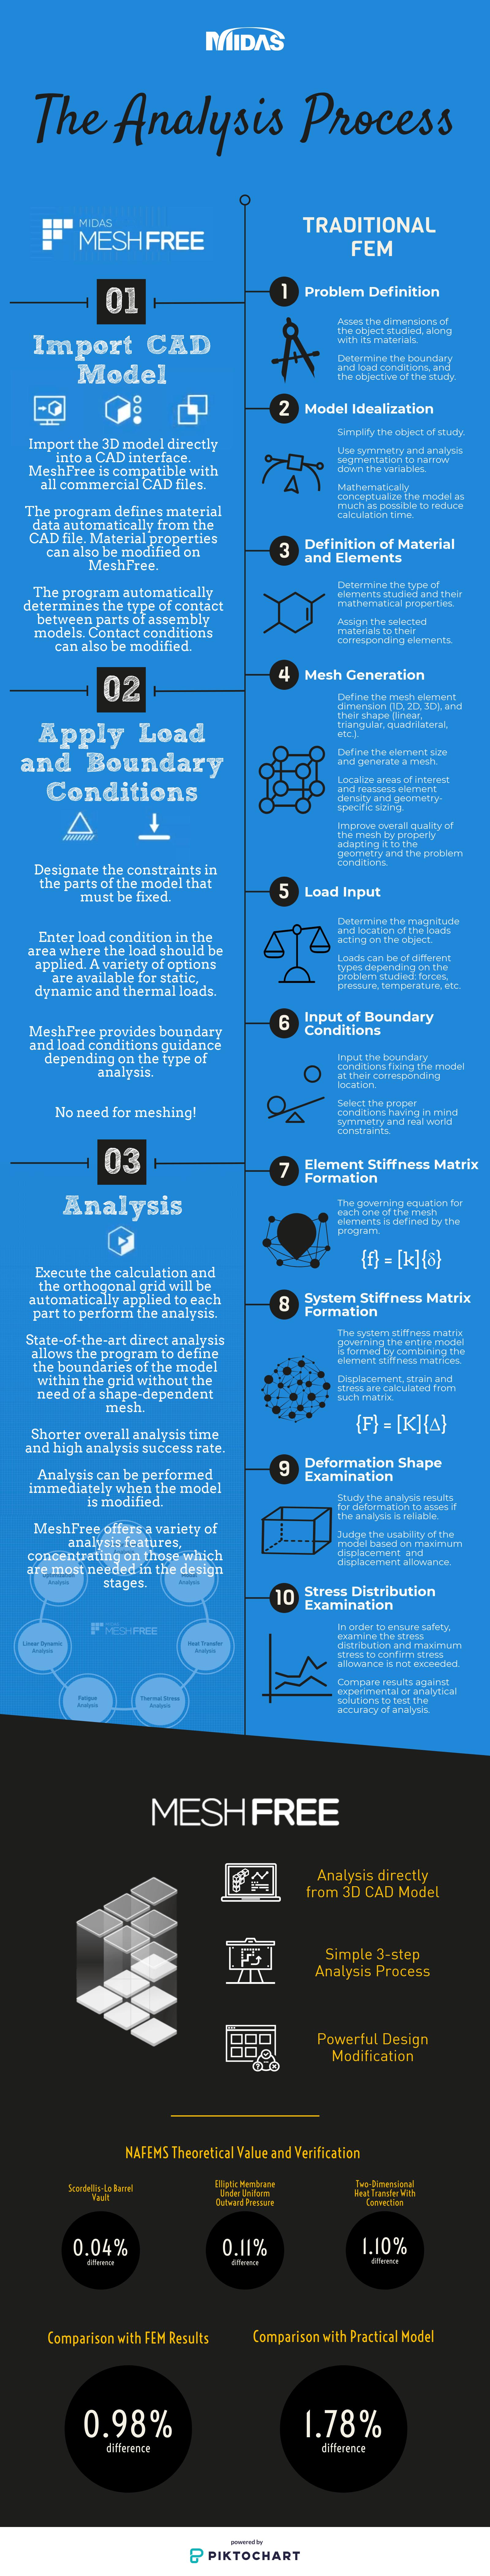 The Analysis Process Infographic: MeshFree vs Traditional FEM